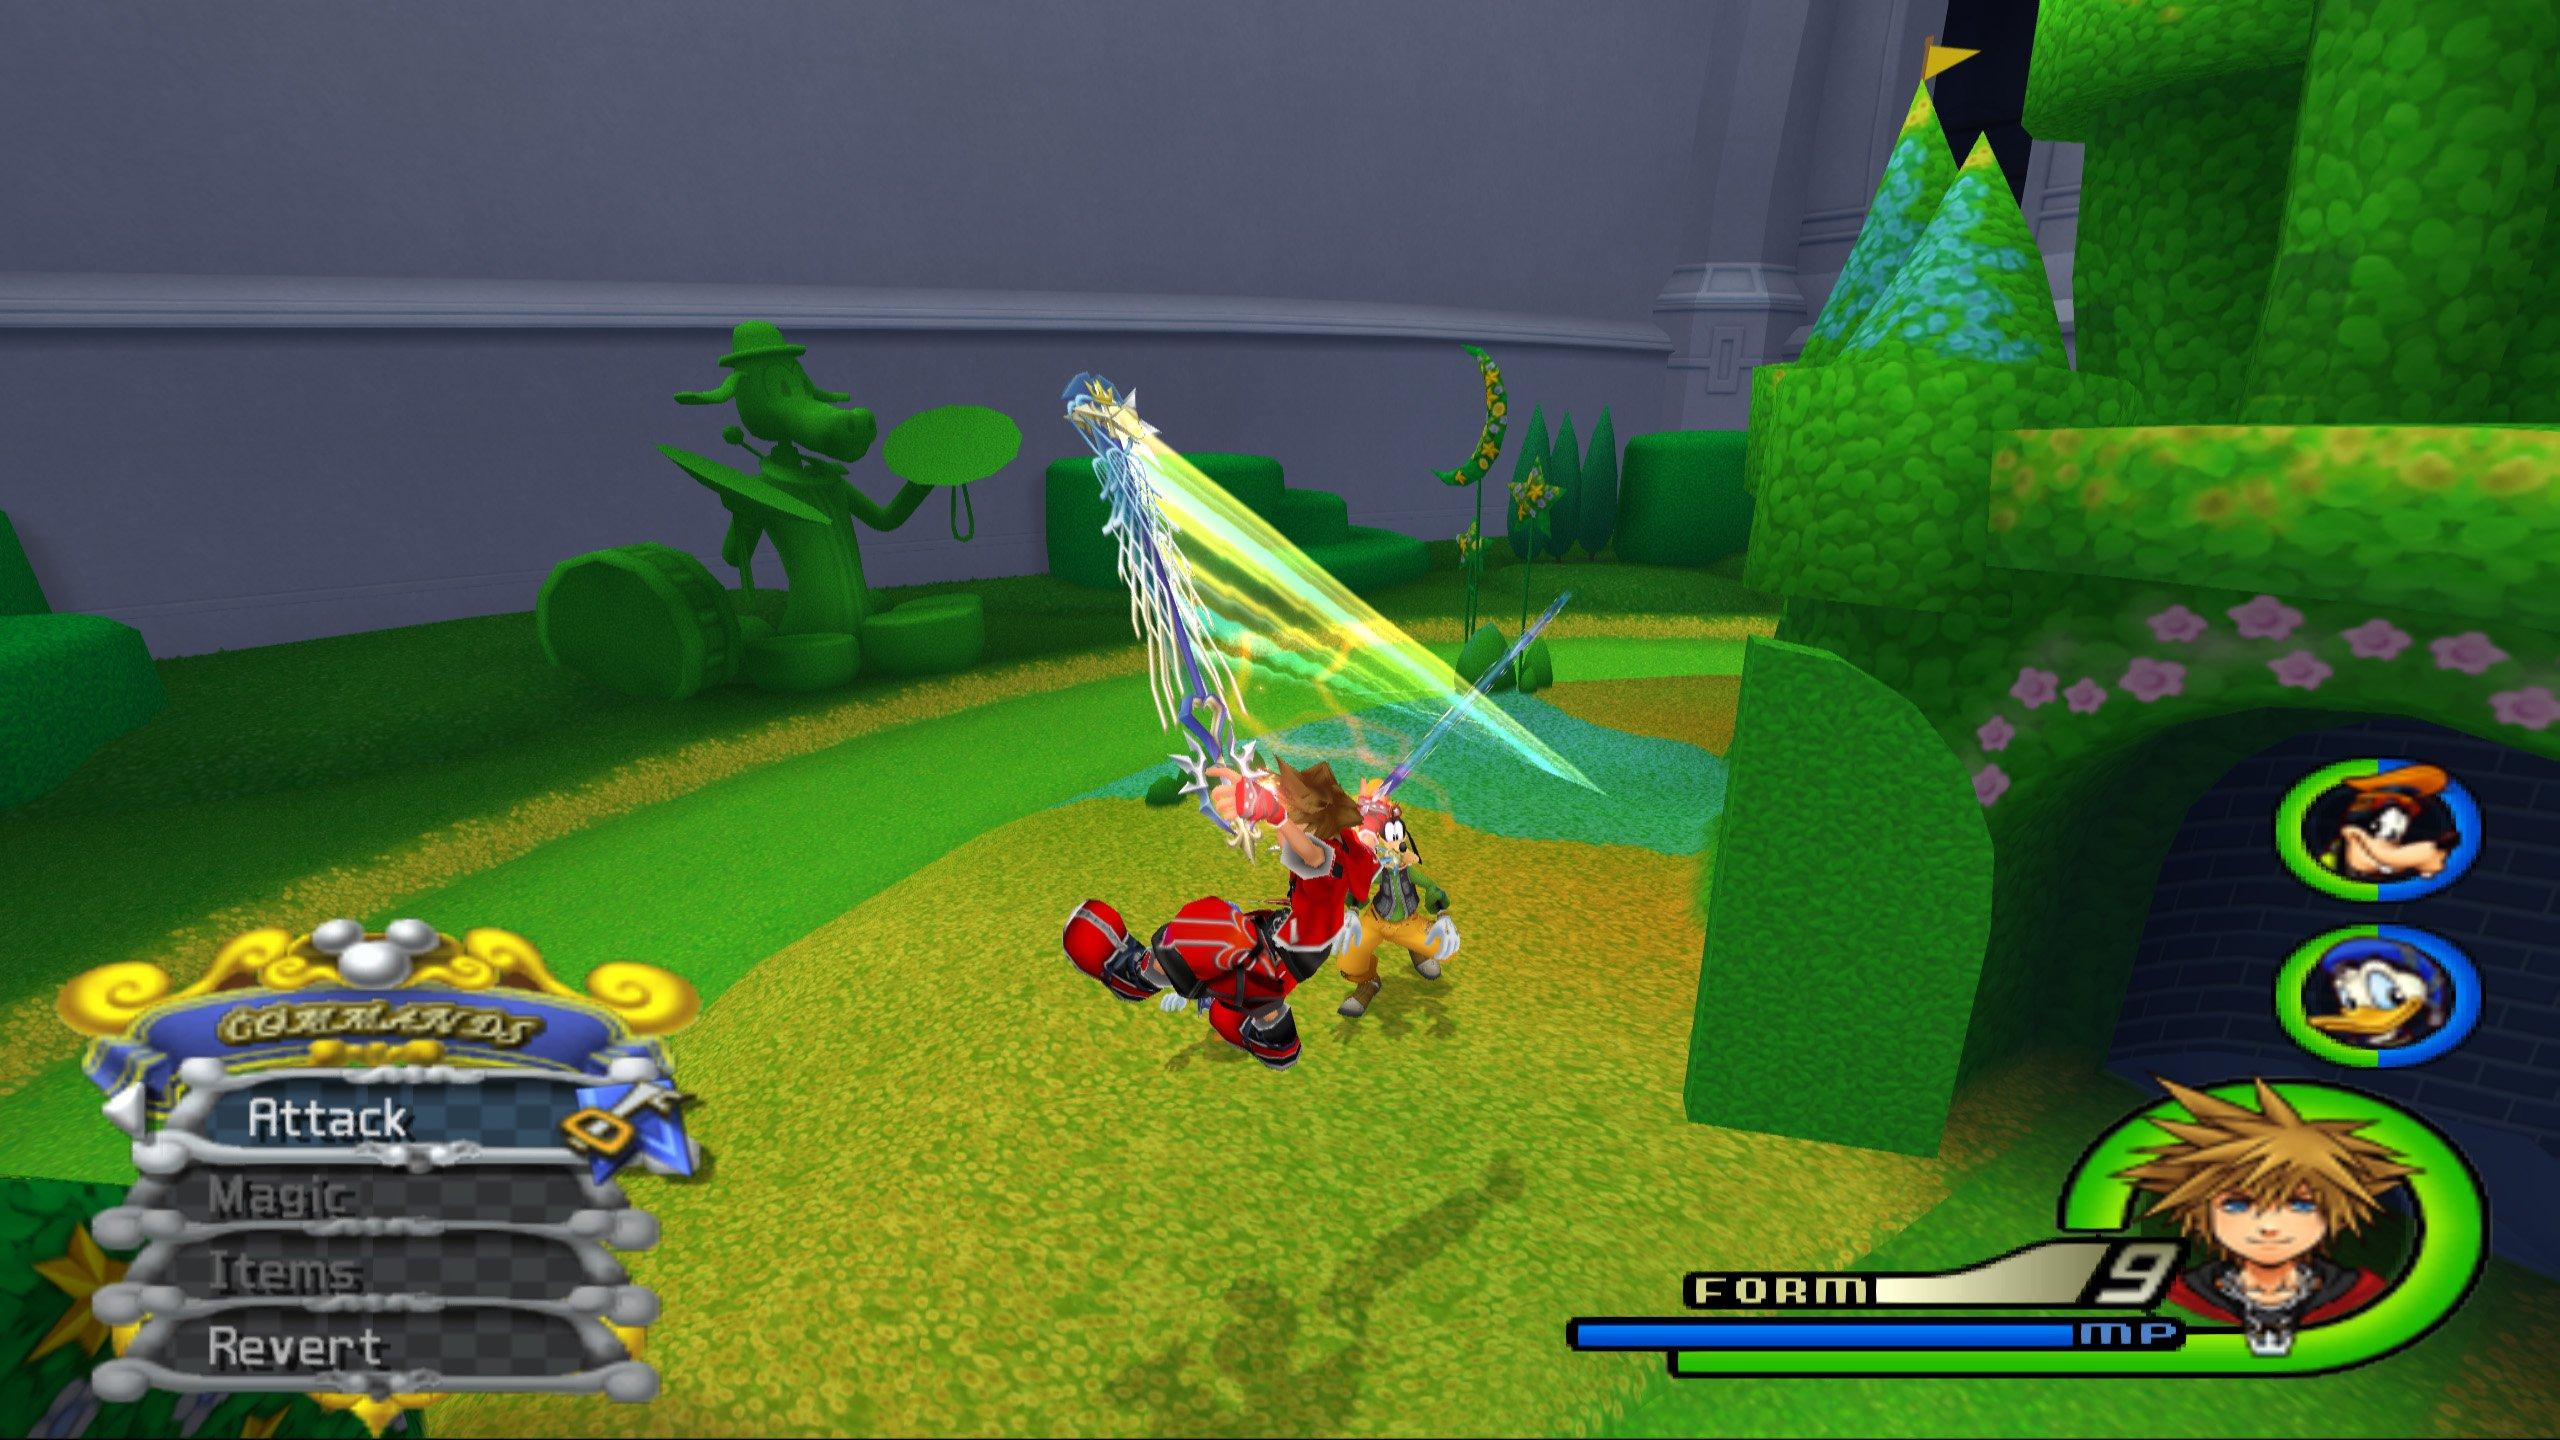 [Image: KH2_-_Gameplay_1.jpg]